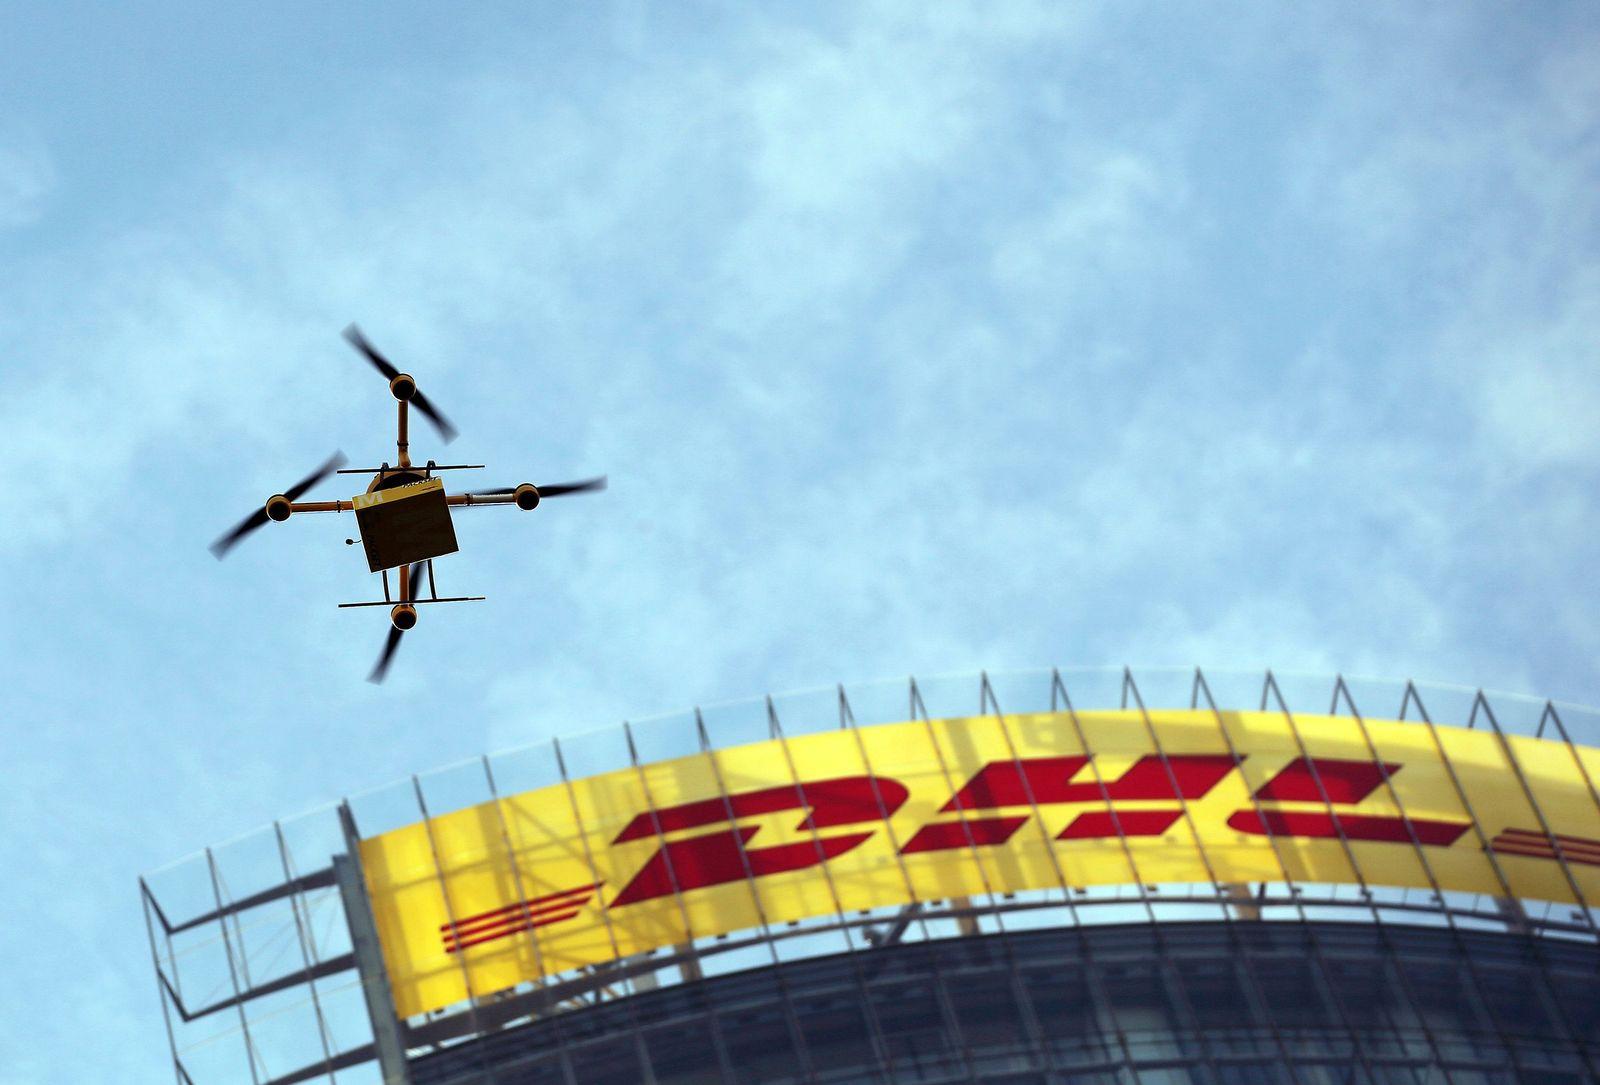 Paketkopter / Paketdrohne / Drohne / DHL